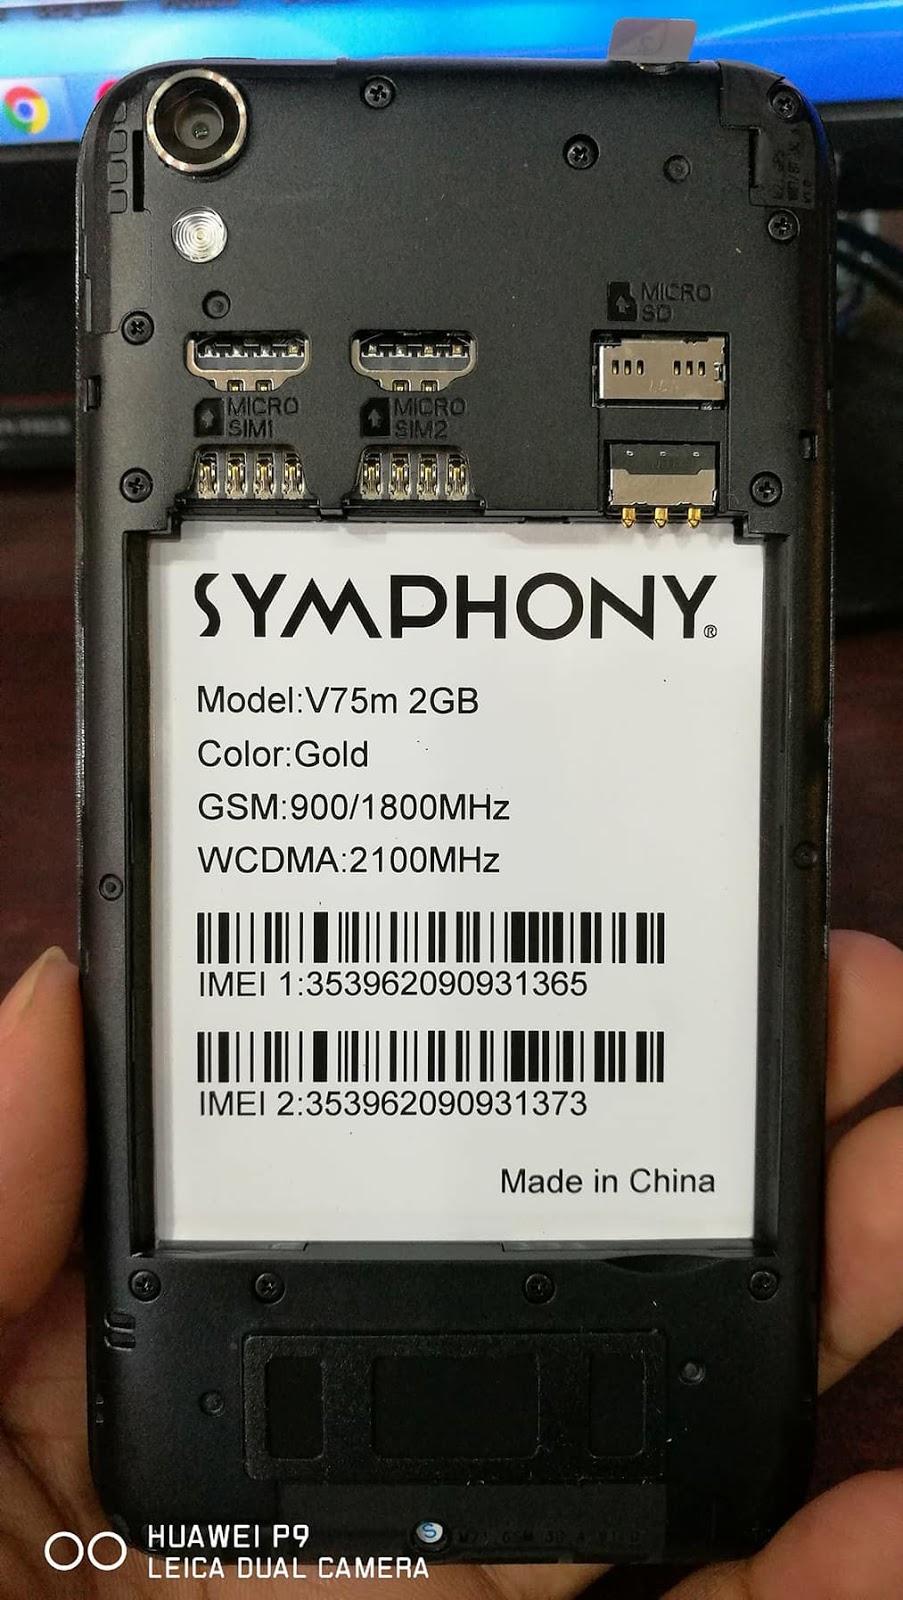 Symphony V75m 2GB Flash File